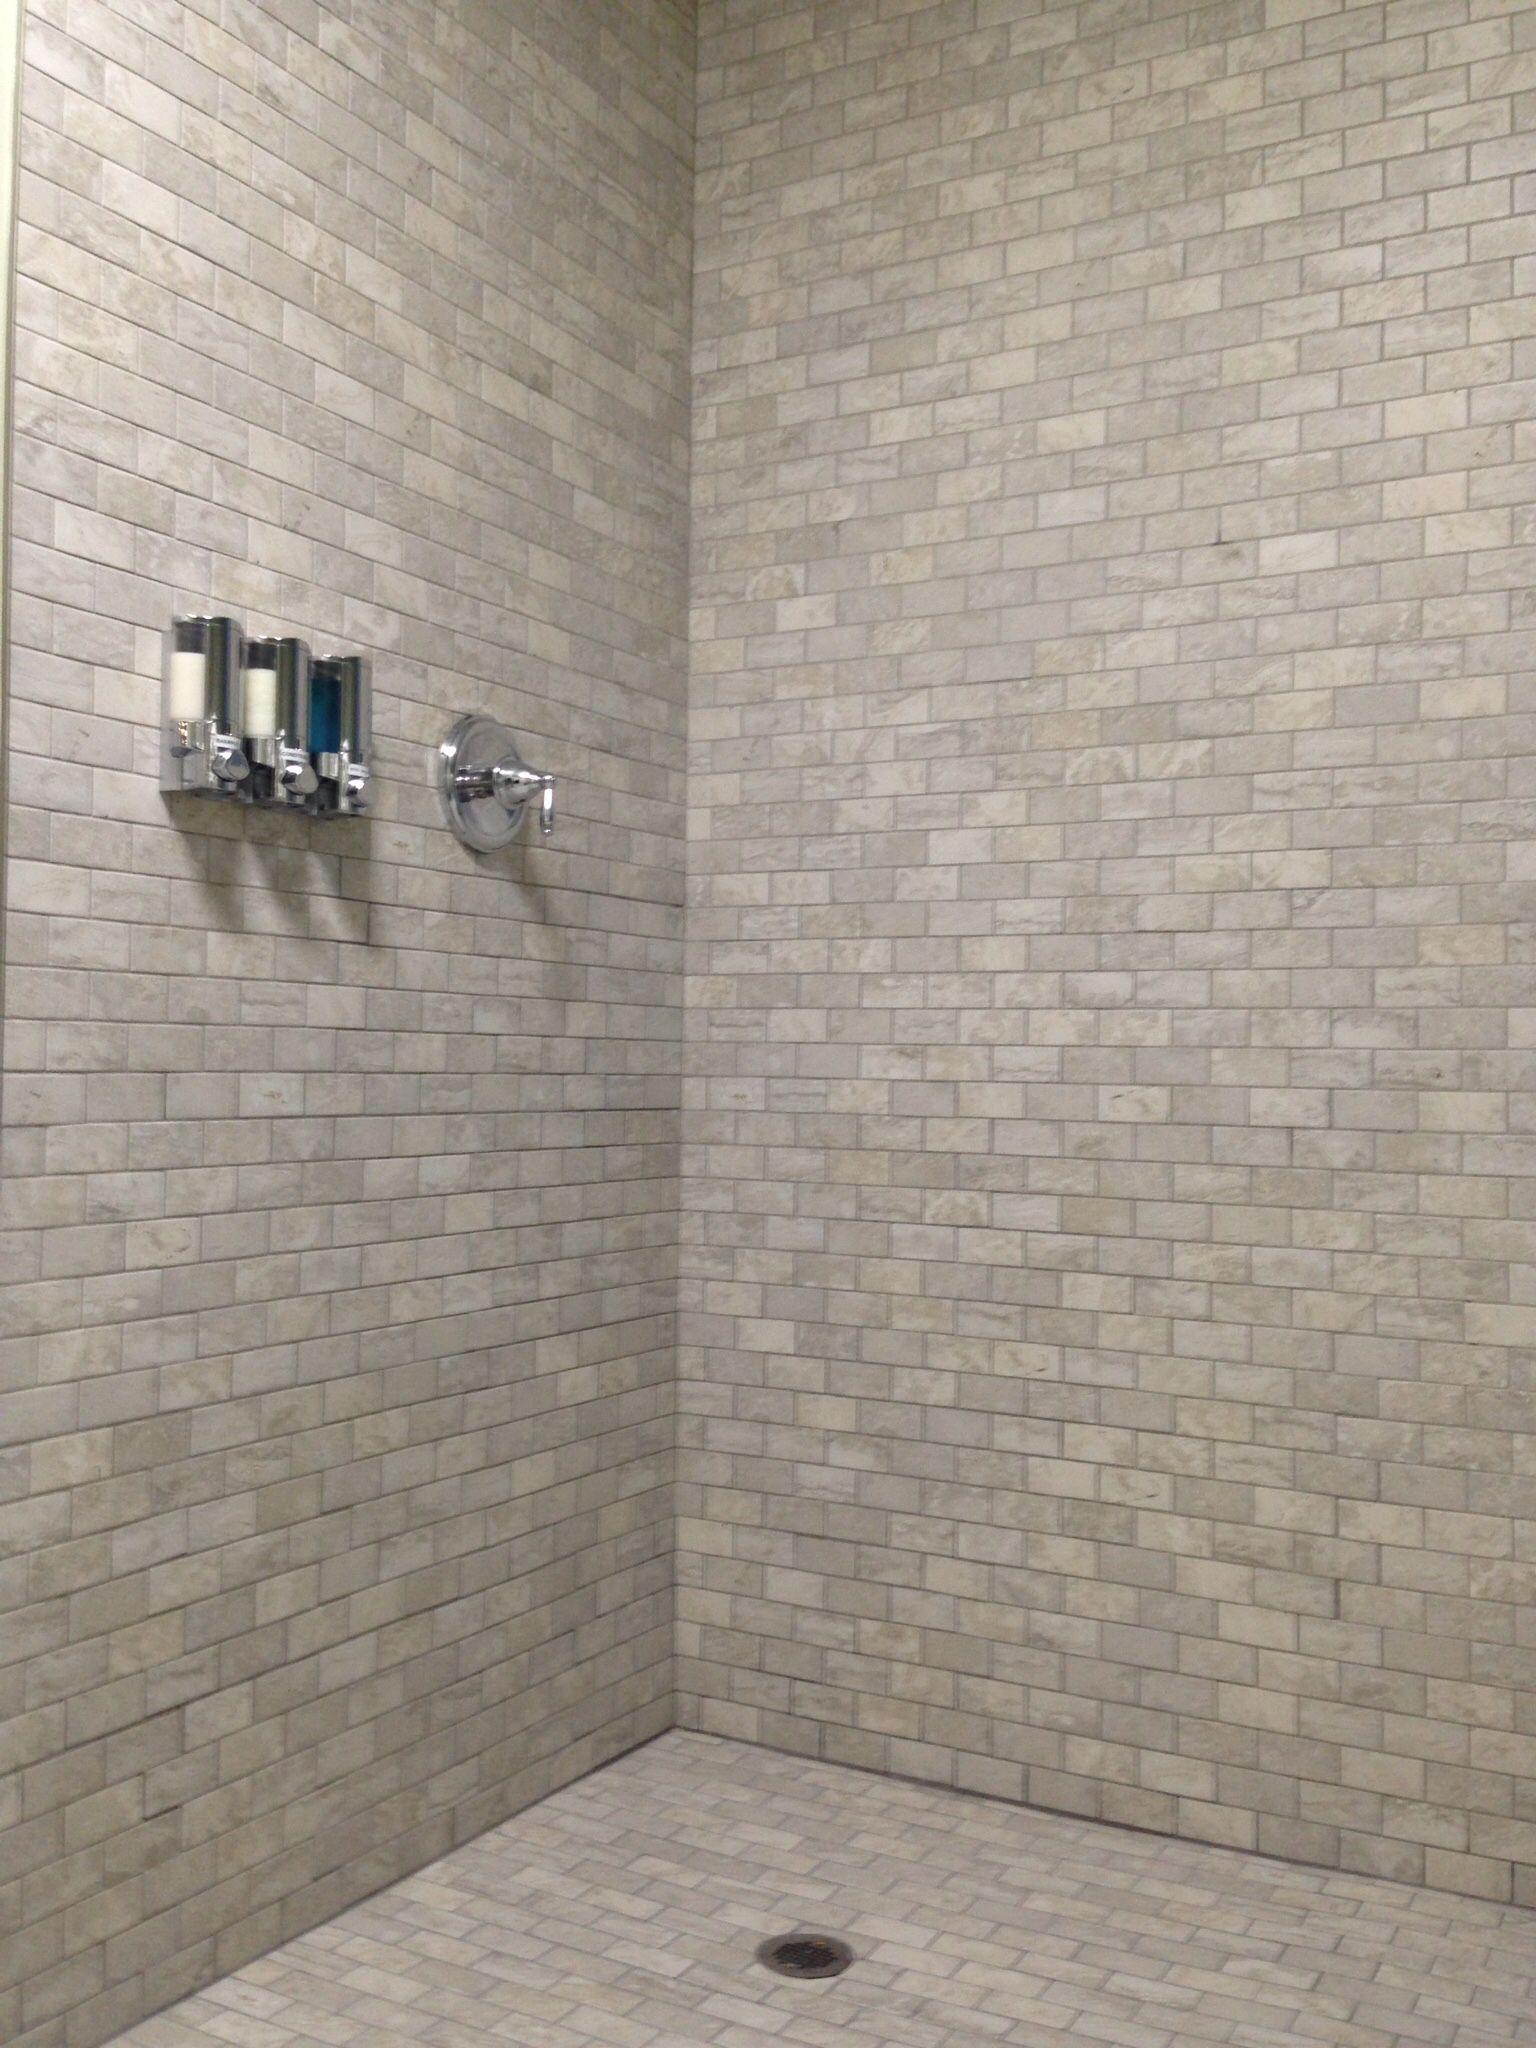 Daltile Exquisite Eq11 Chantilly 2x4 Mosaic Mosaic Bathroom Tile